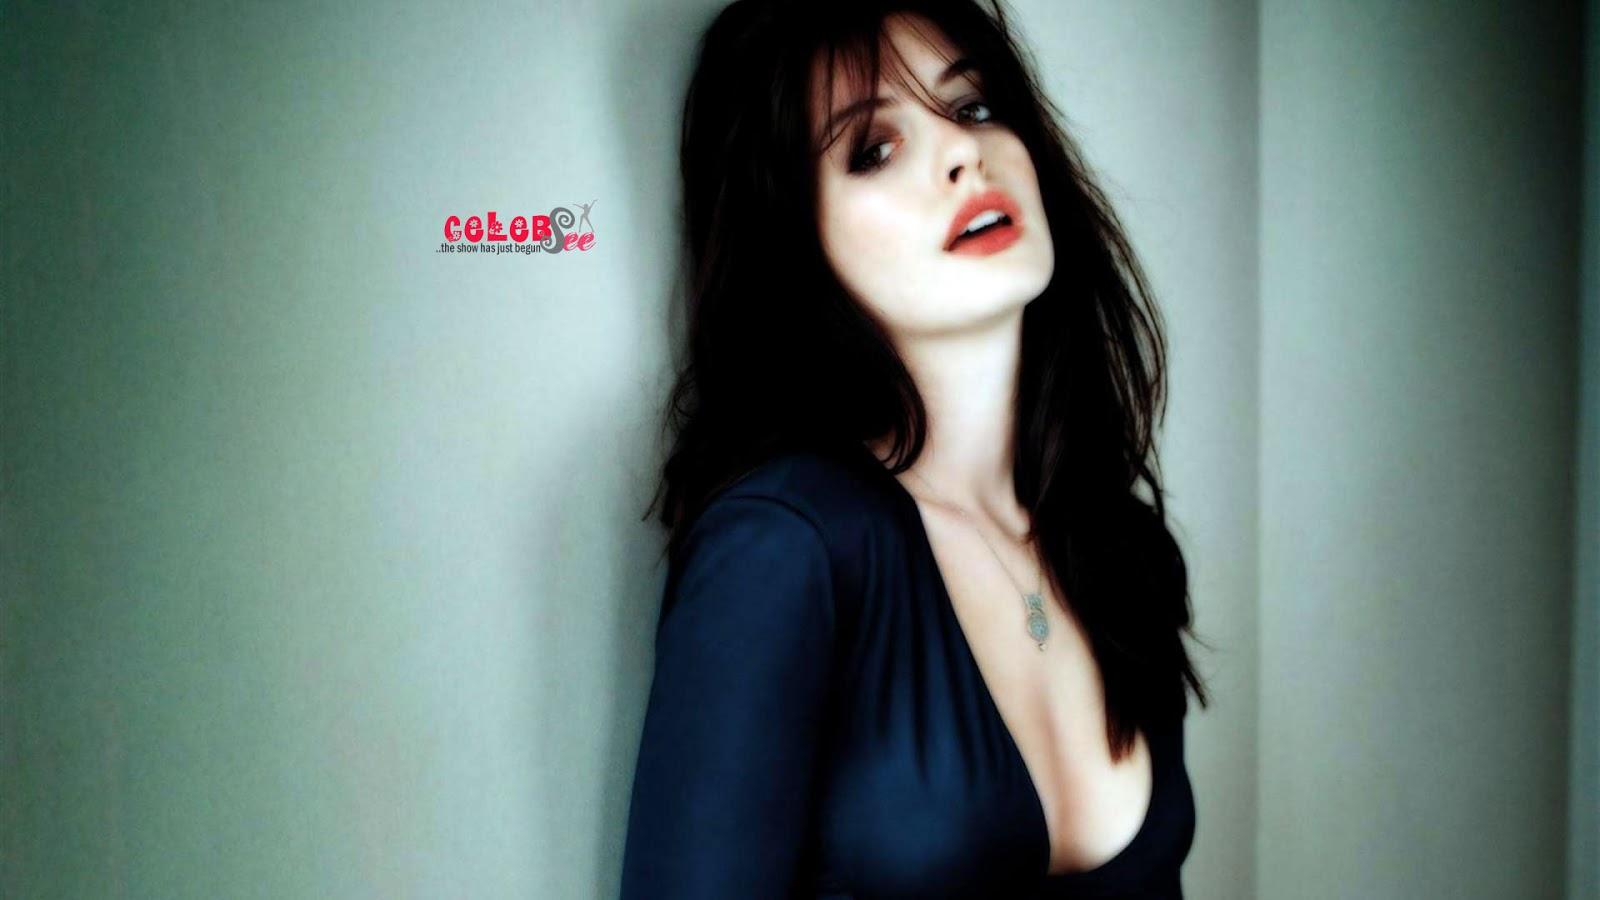 Cute Stylish Girl Wallpaper Hd Anne Hathaway Hot Hd Photos Hollywood Celebsee